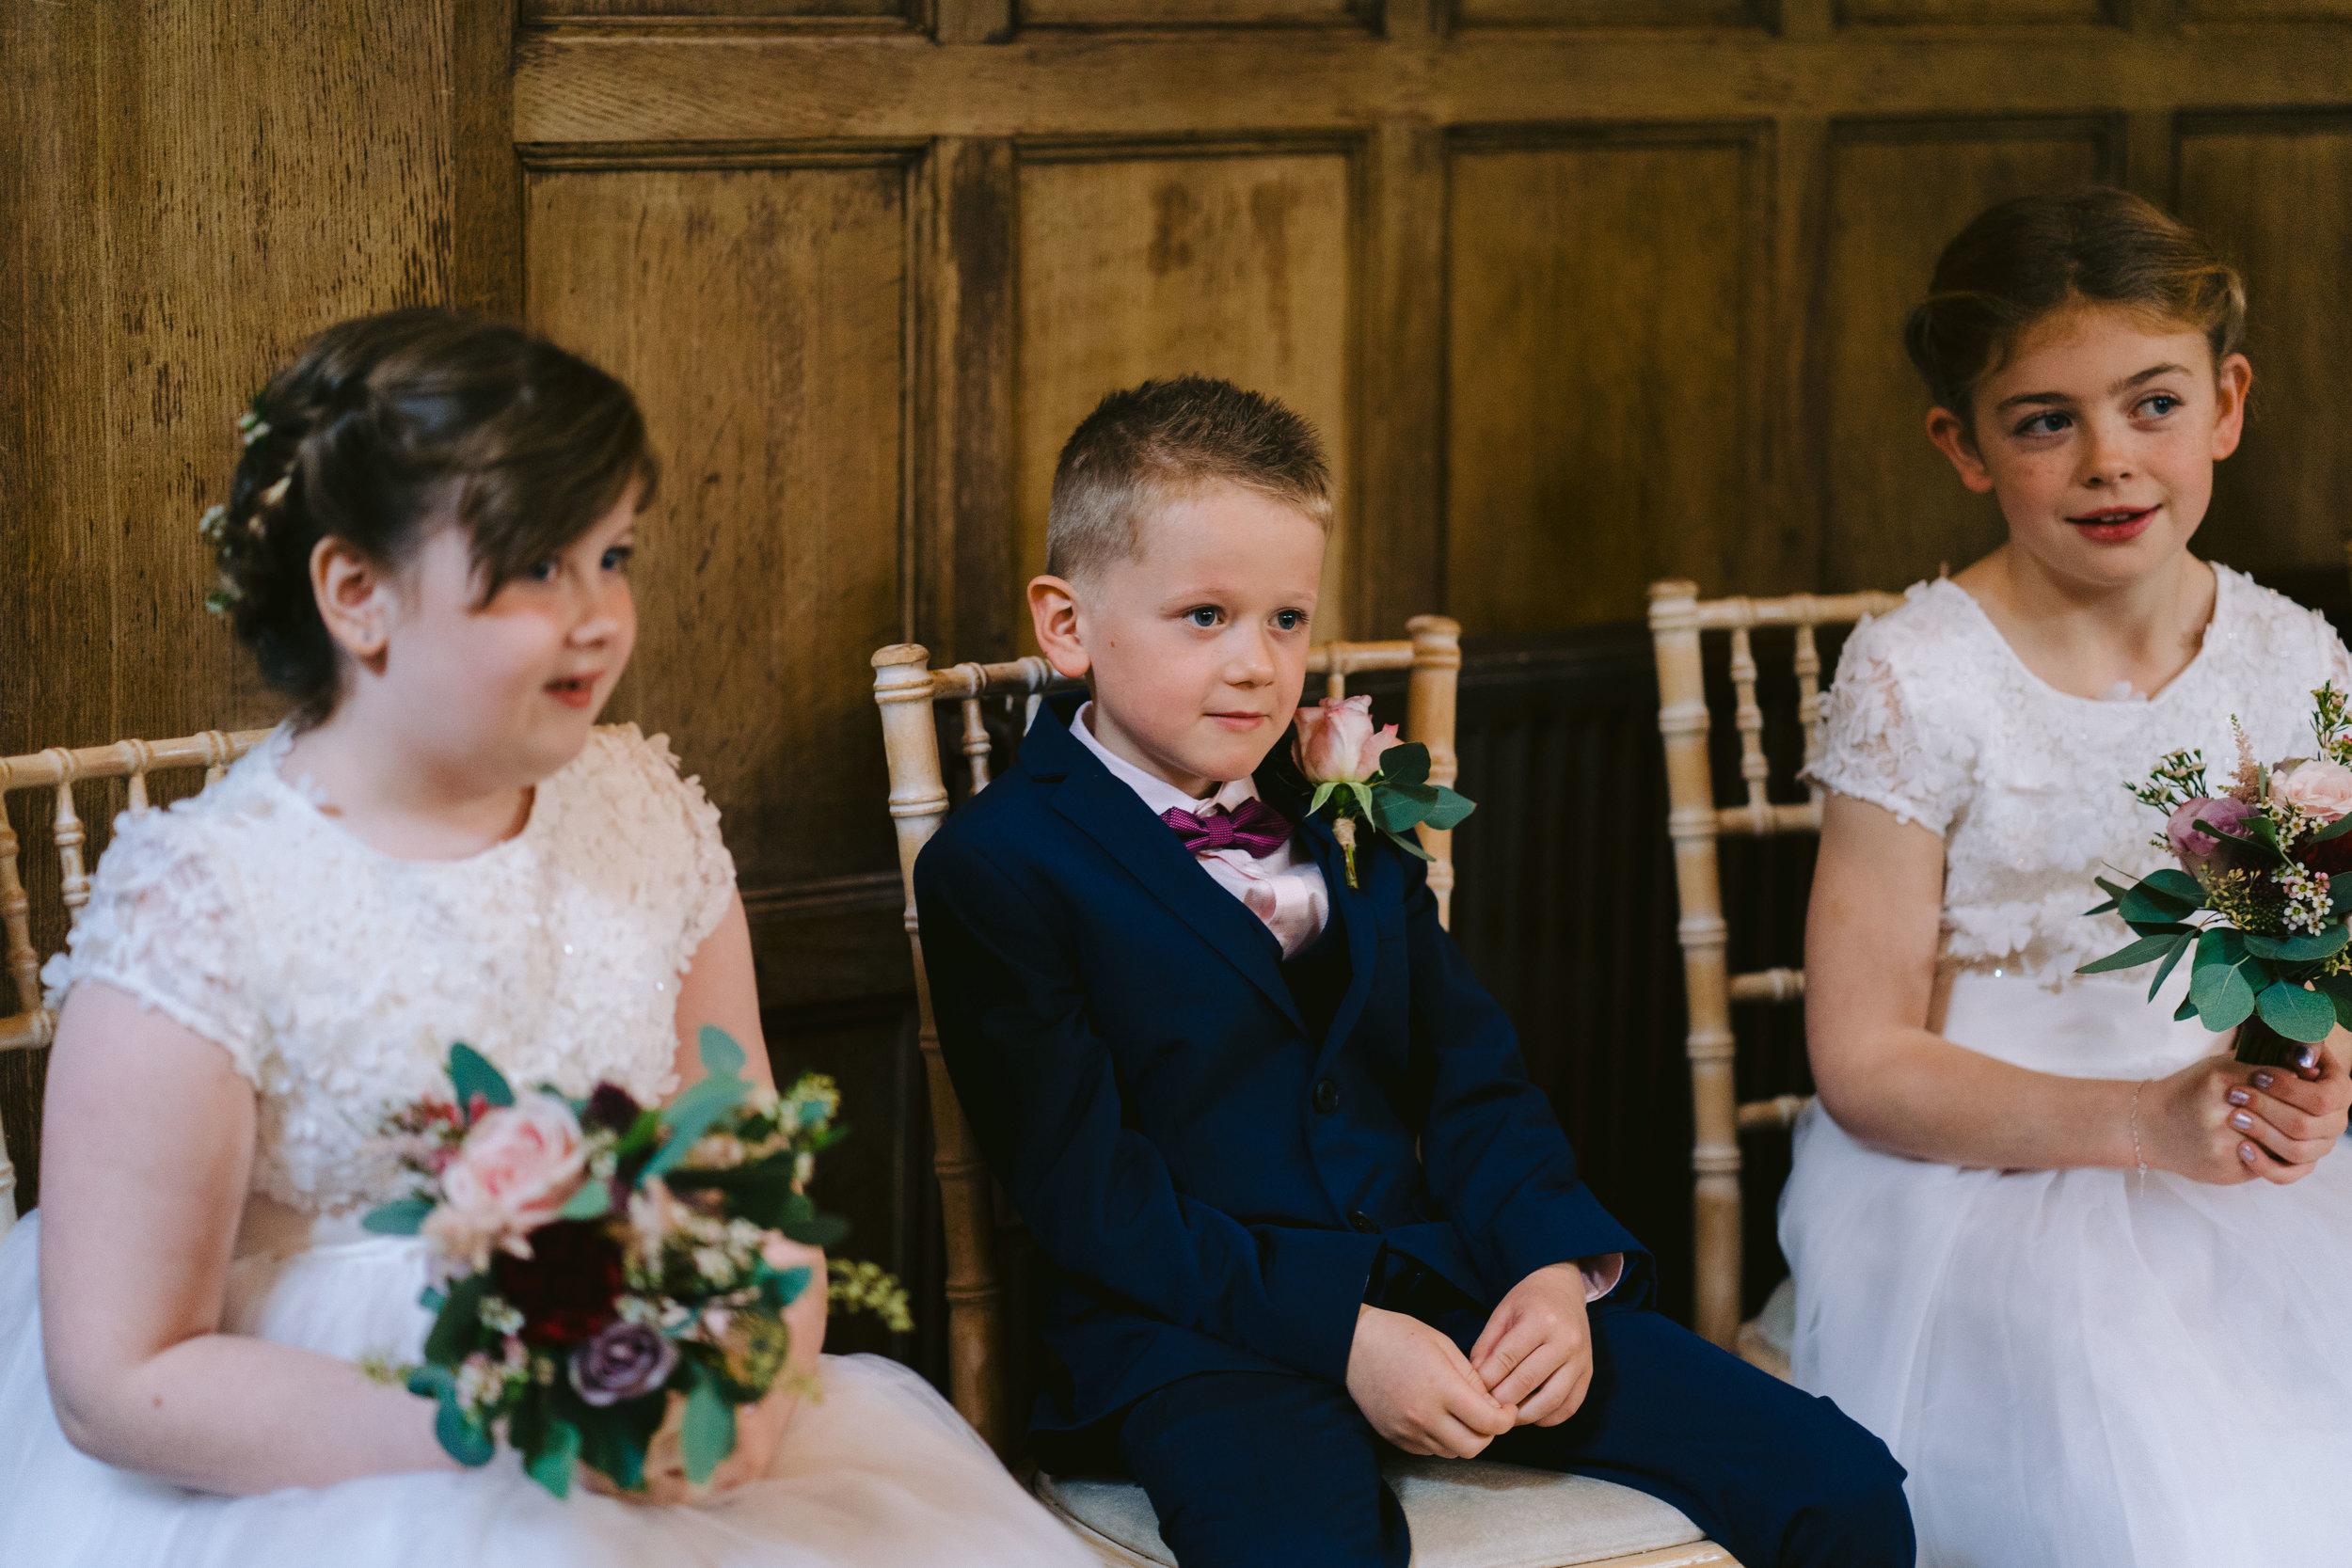 Karin_and_Shauns_Wedding_-_Achnagairn_Castle_-_www.eilidhrobertson.co.uk-403.jpg